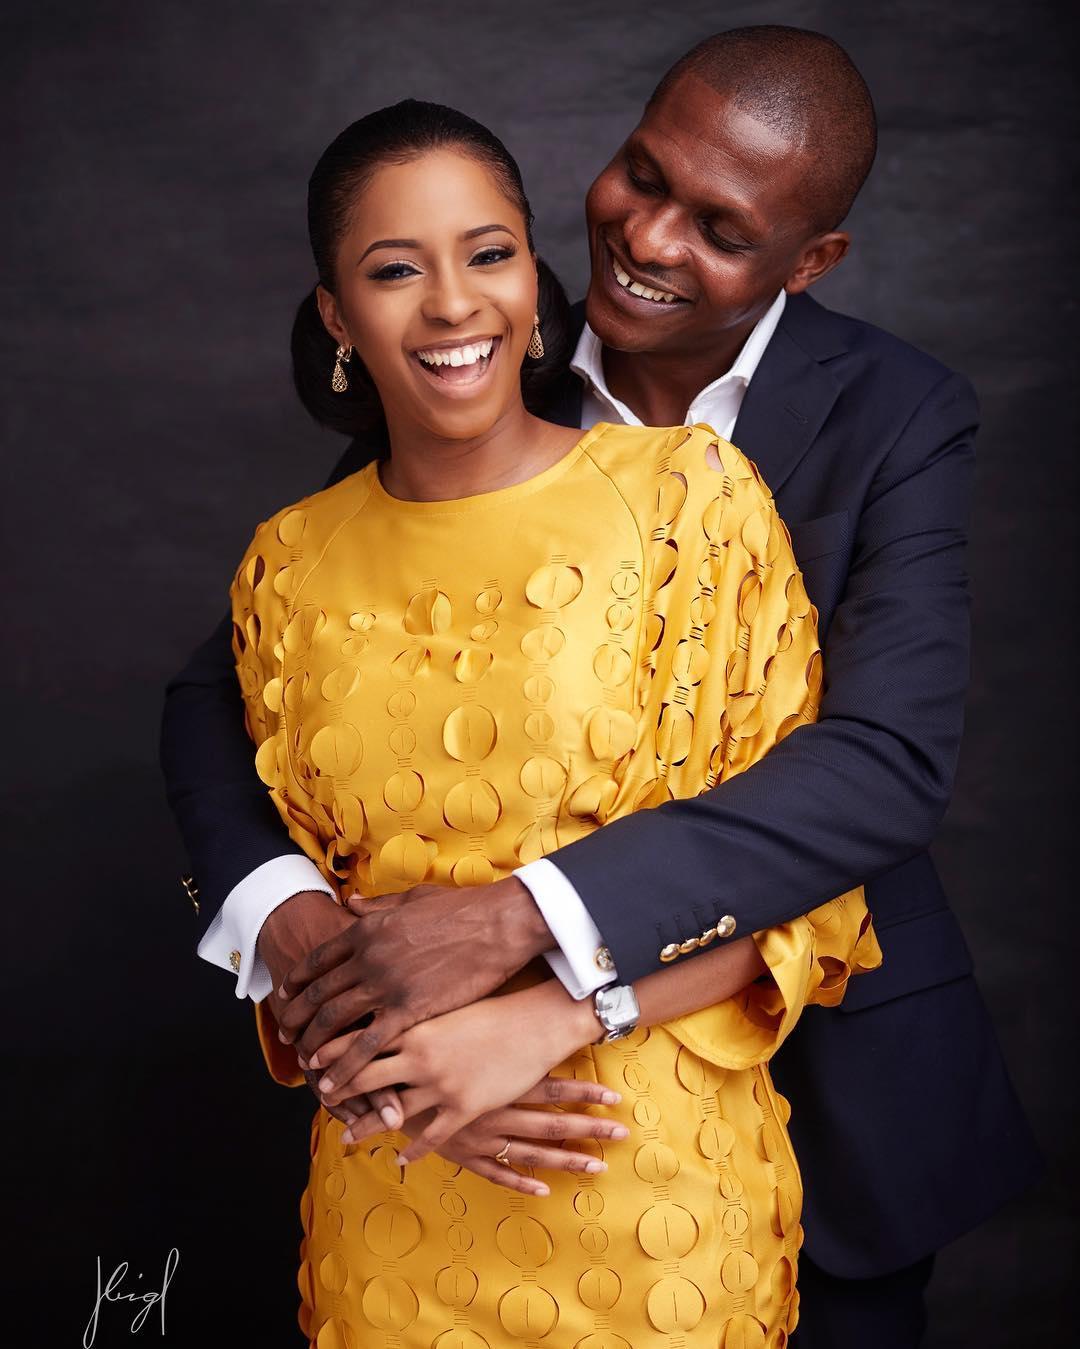 5.) Oluwadamilola Osinbajo and Oluseun Bakare